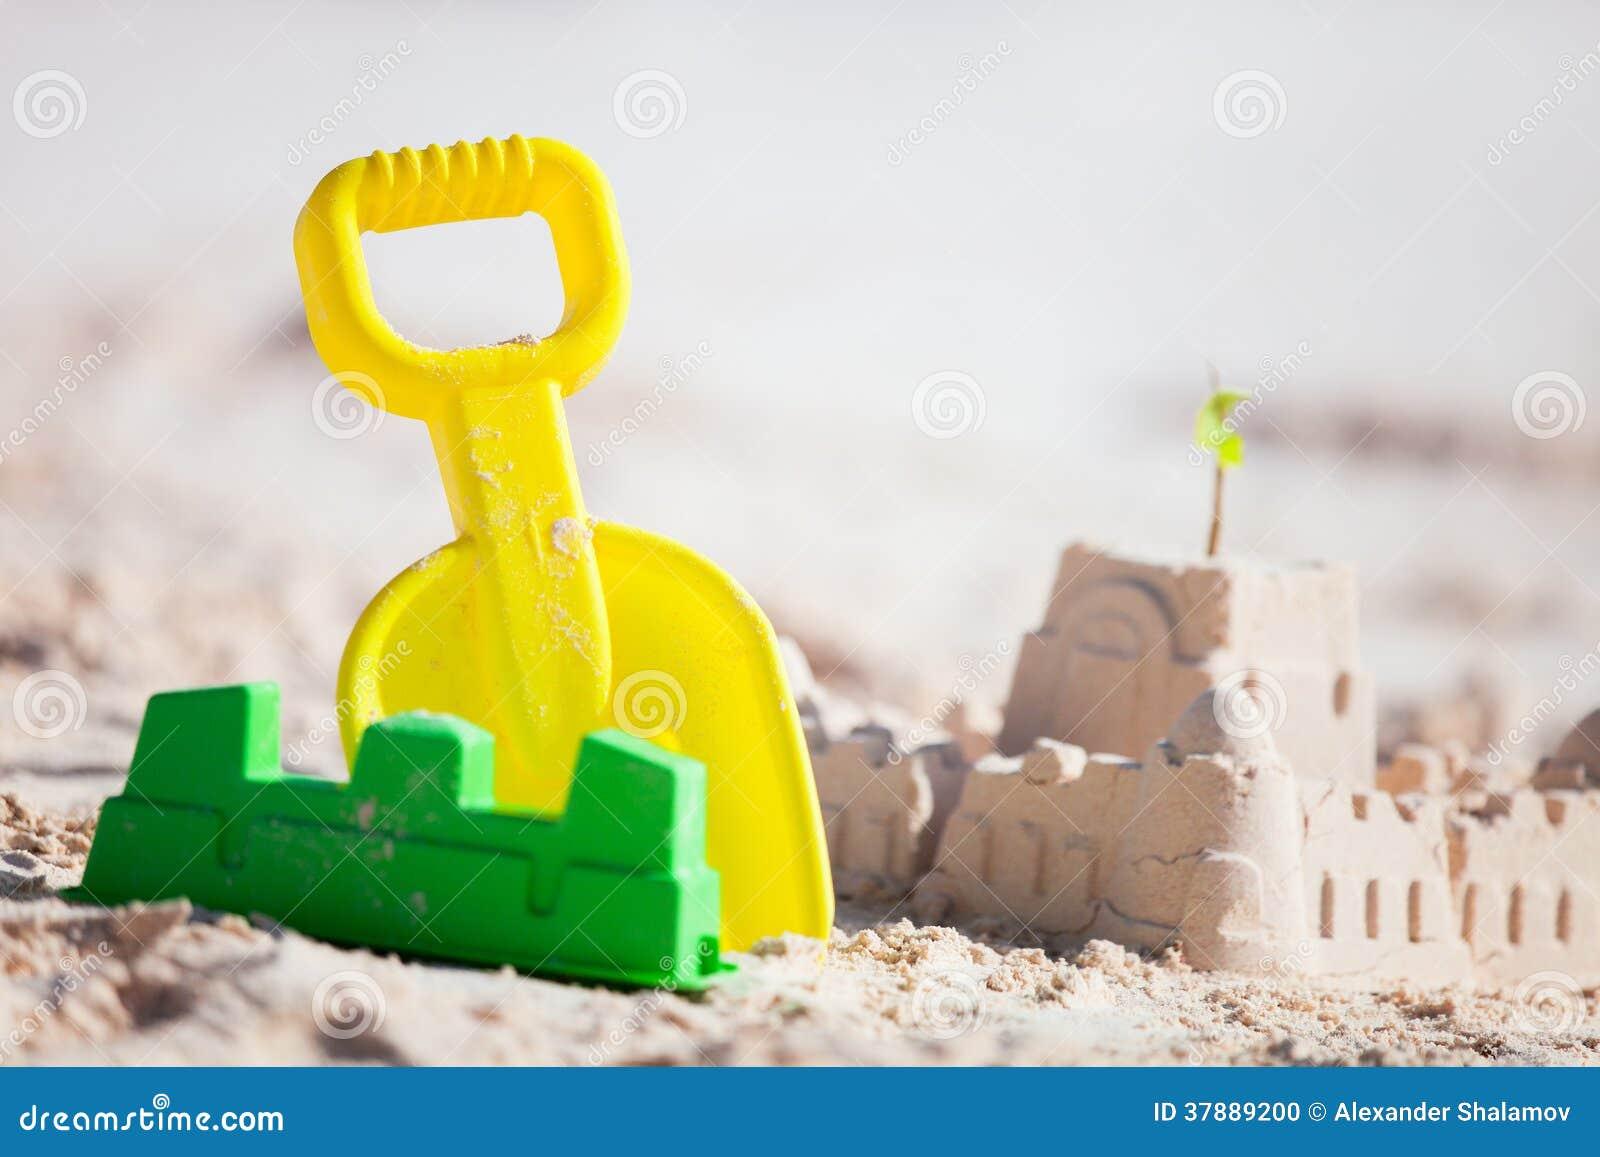 Strandspeelgoed